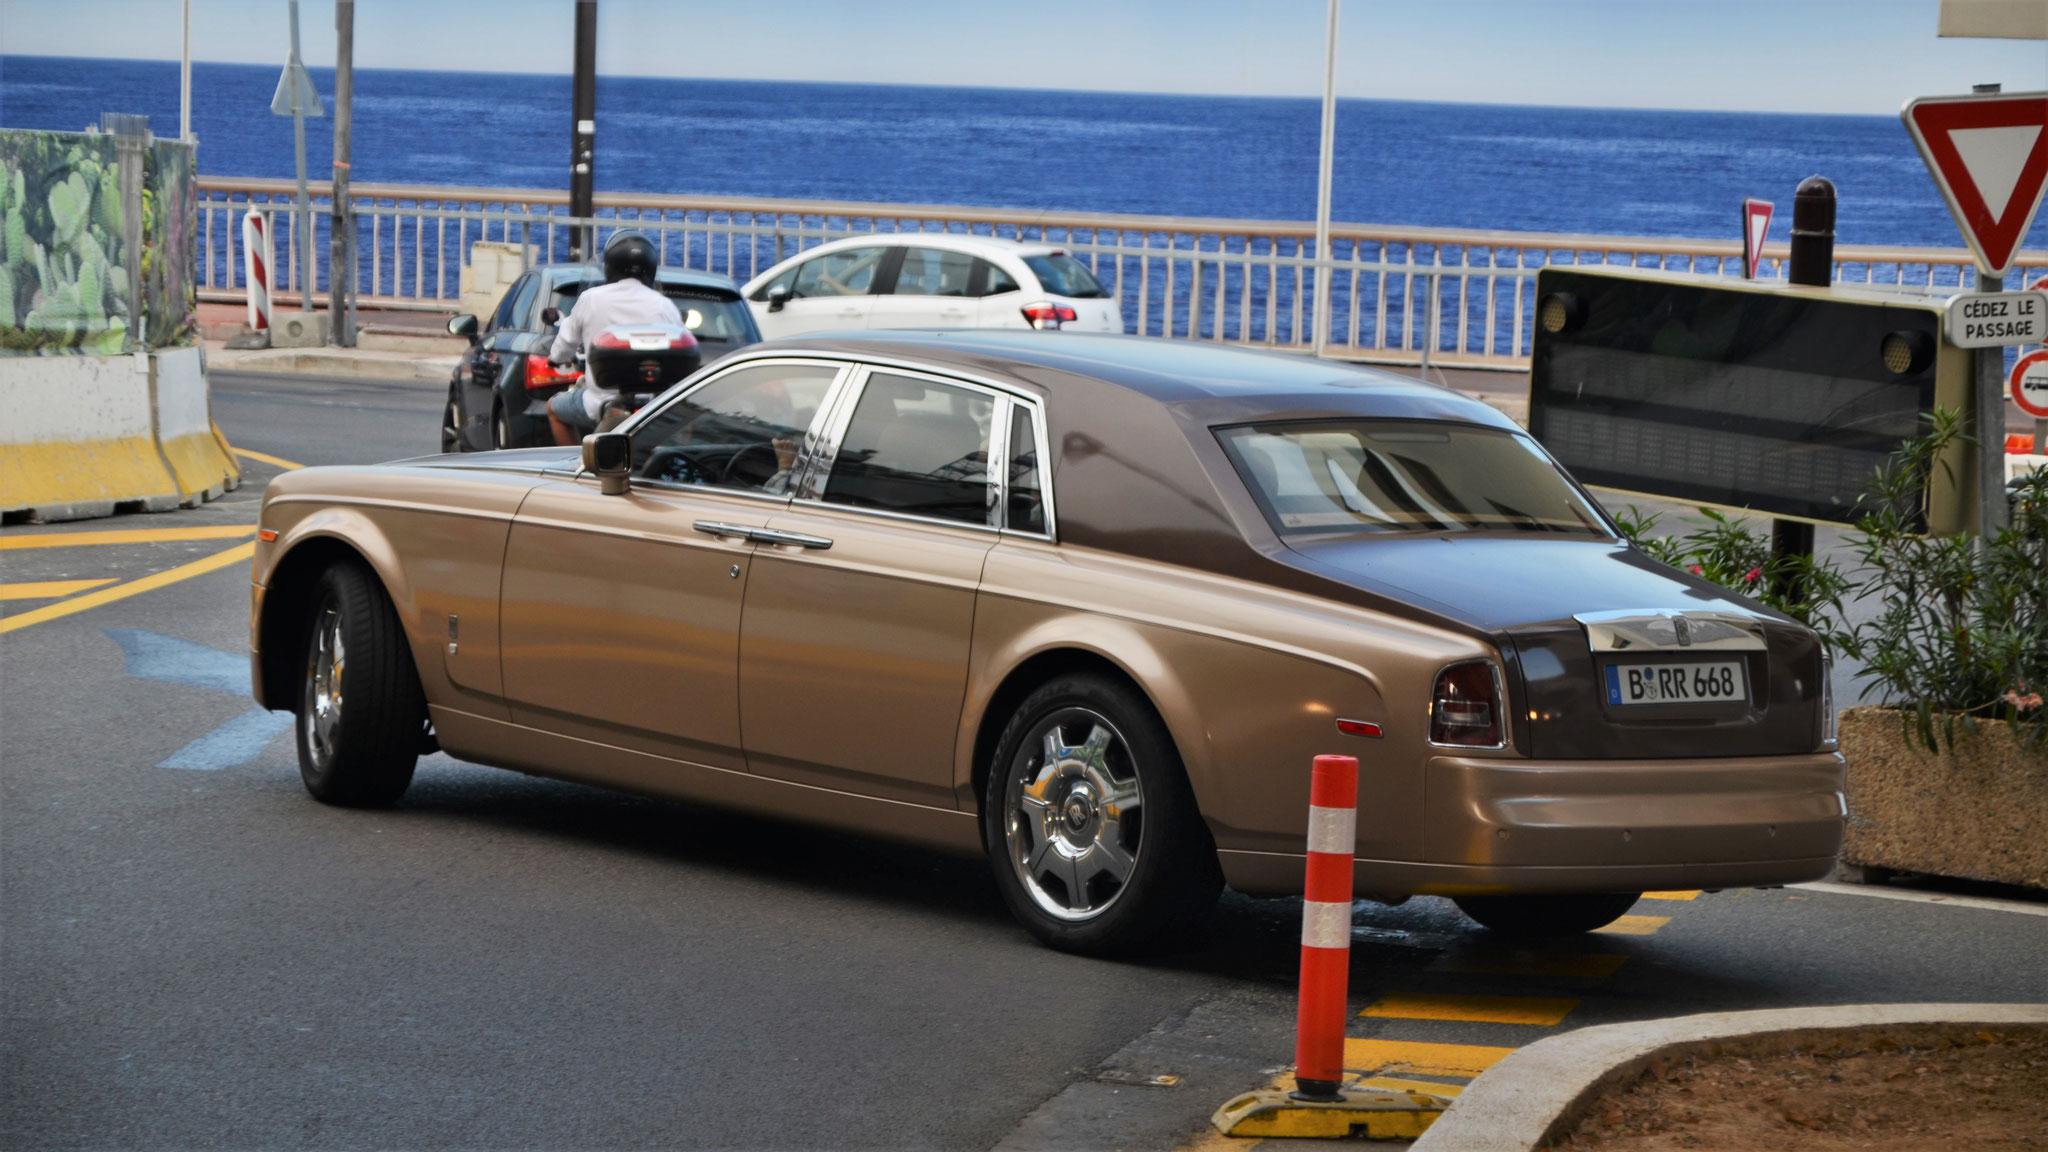 Rolls Royce Phantom - B-RR-668